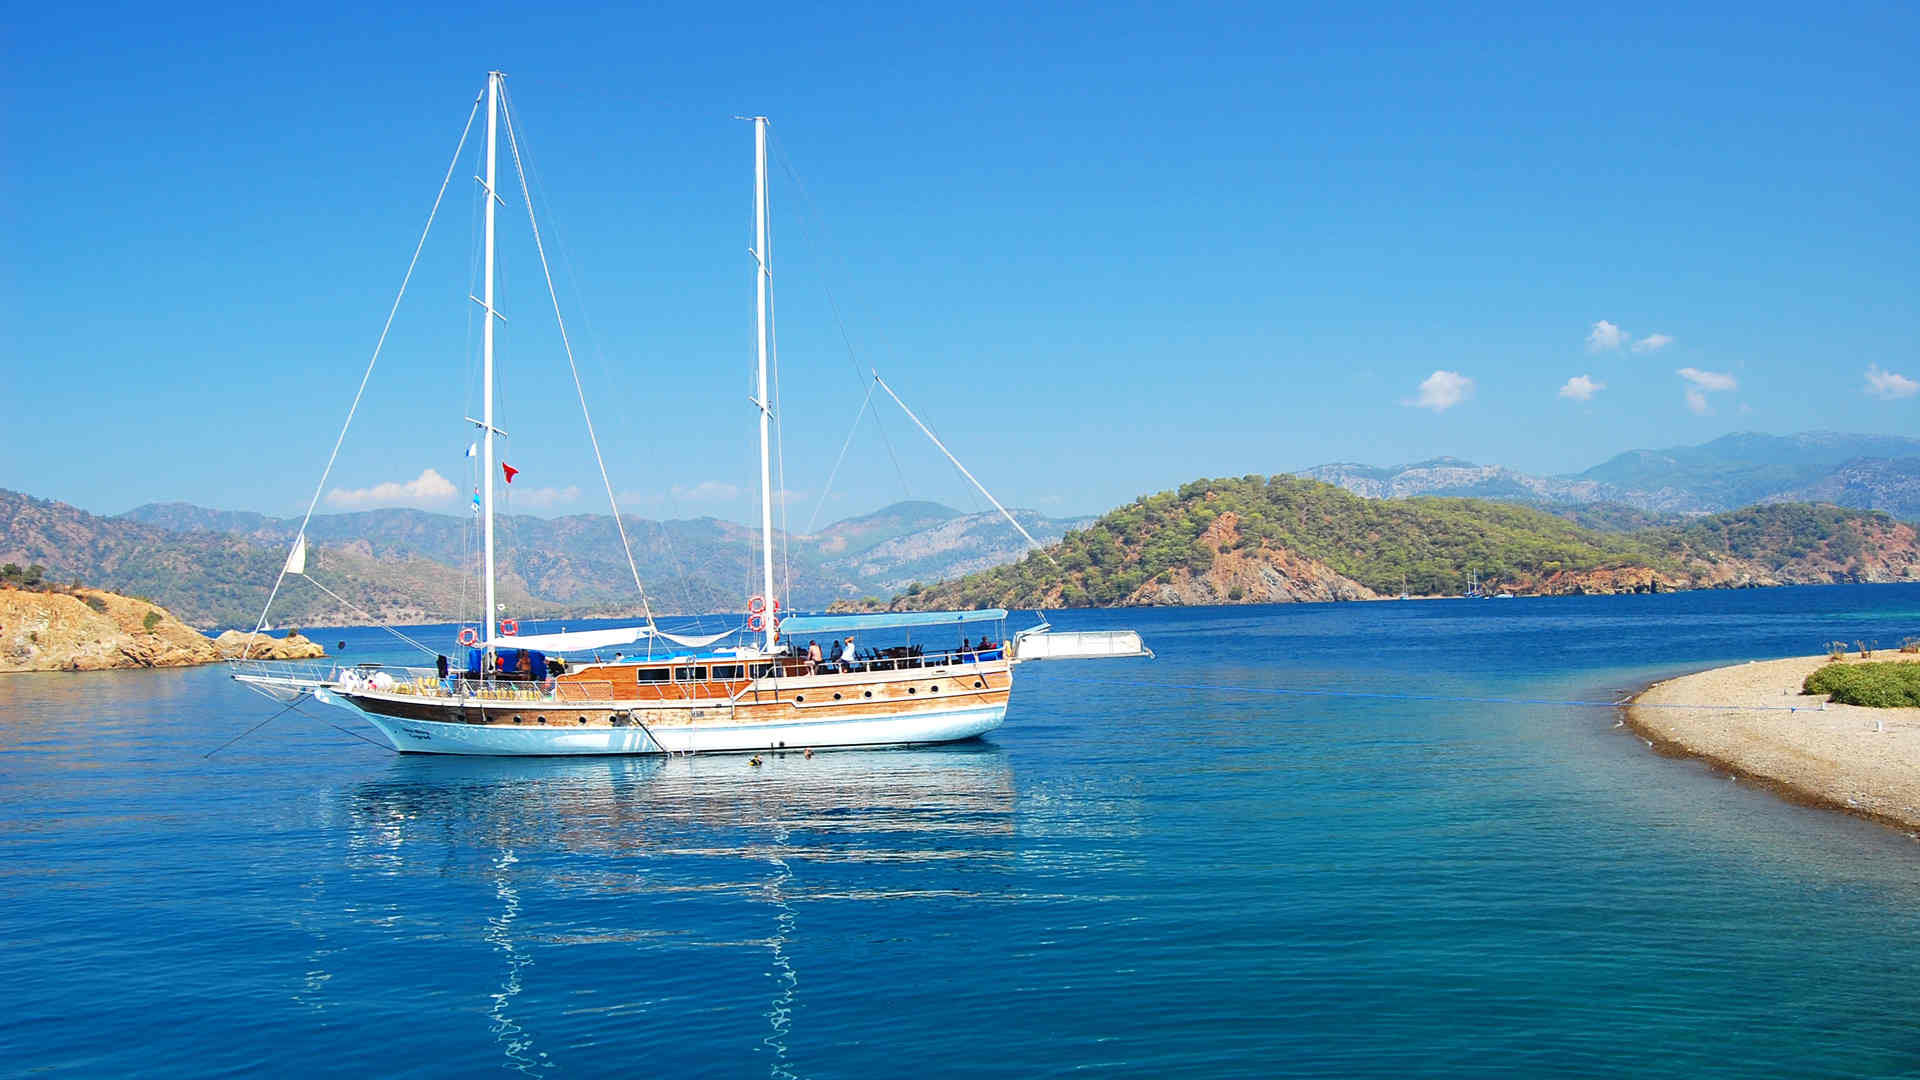 Tailor Made Cruise in Antalya in Turkey